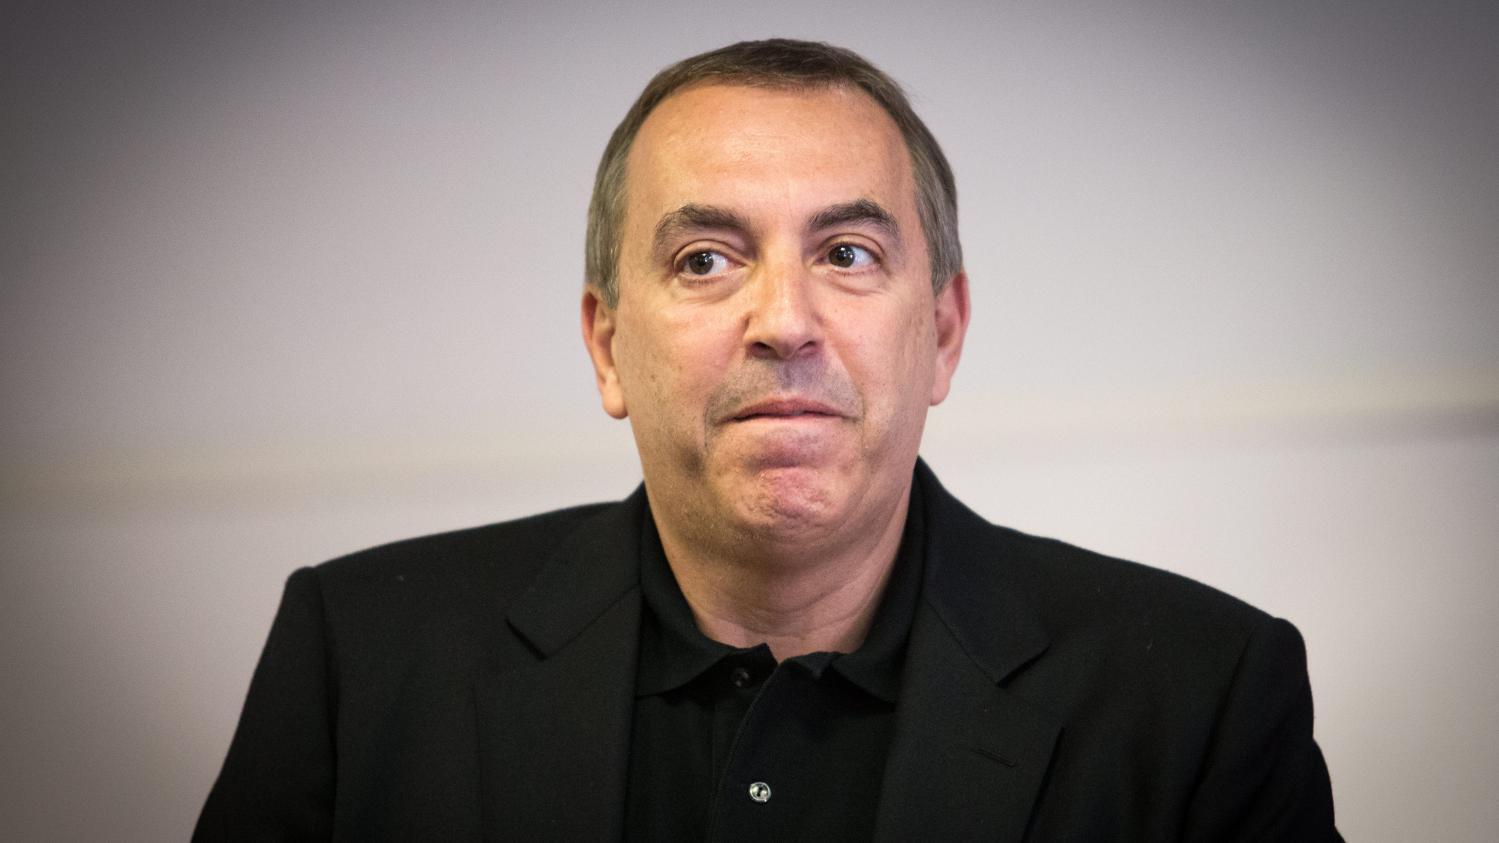 Jean-Marc Morandini en correctionnelle